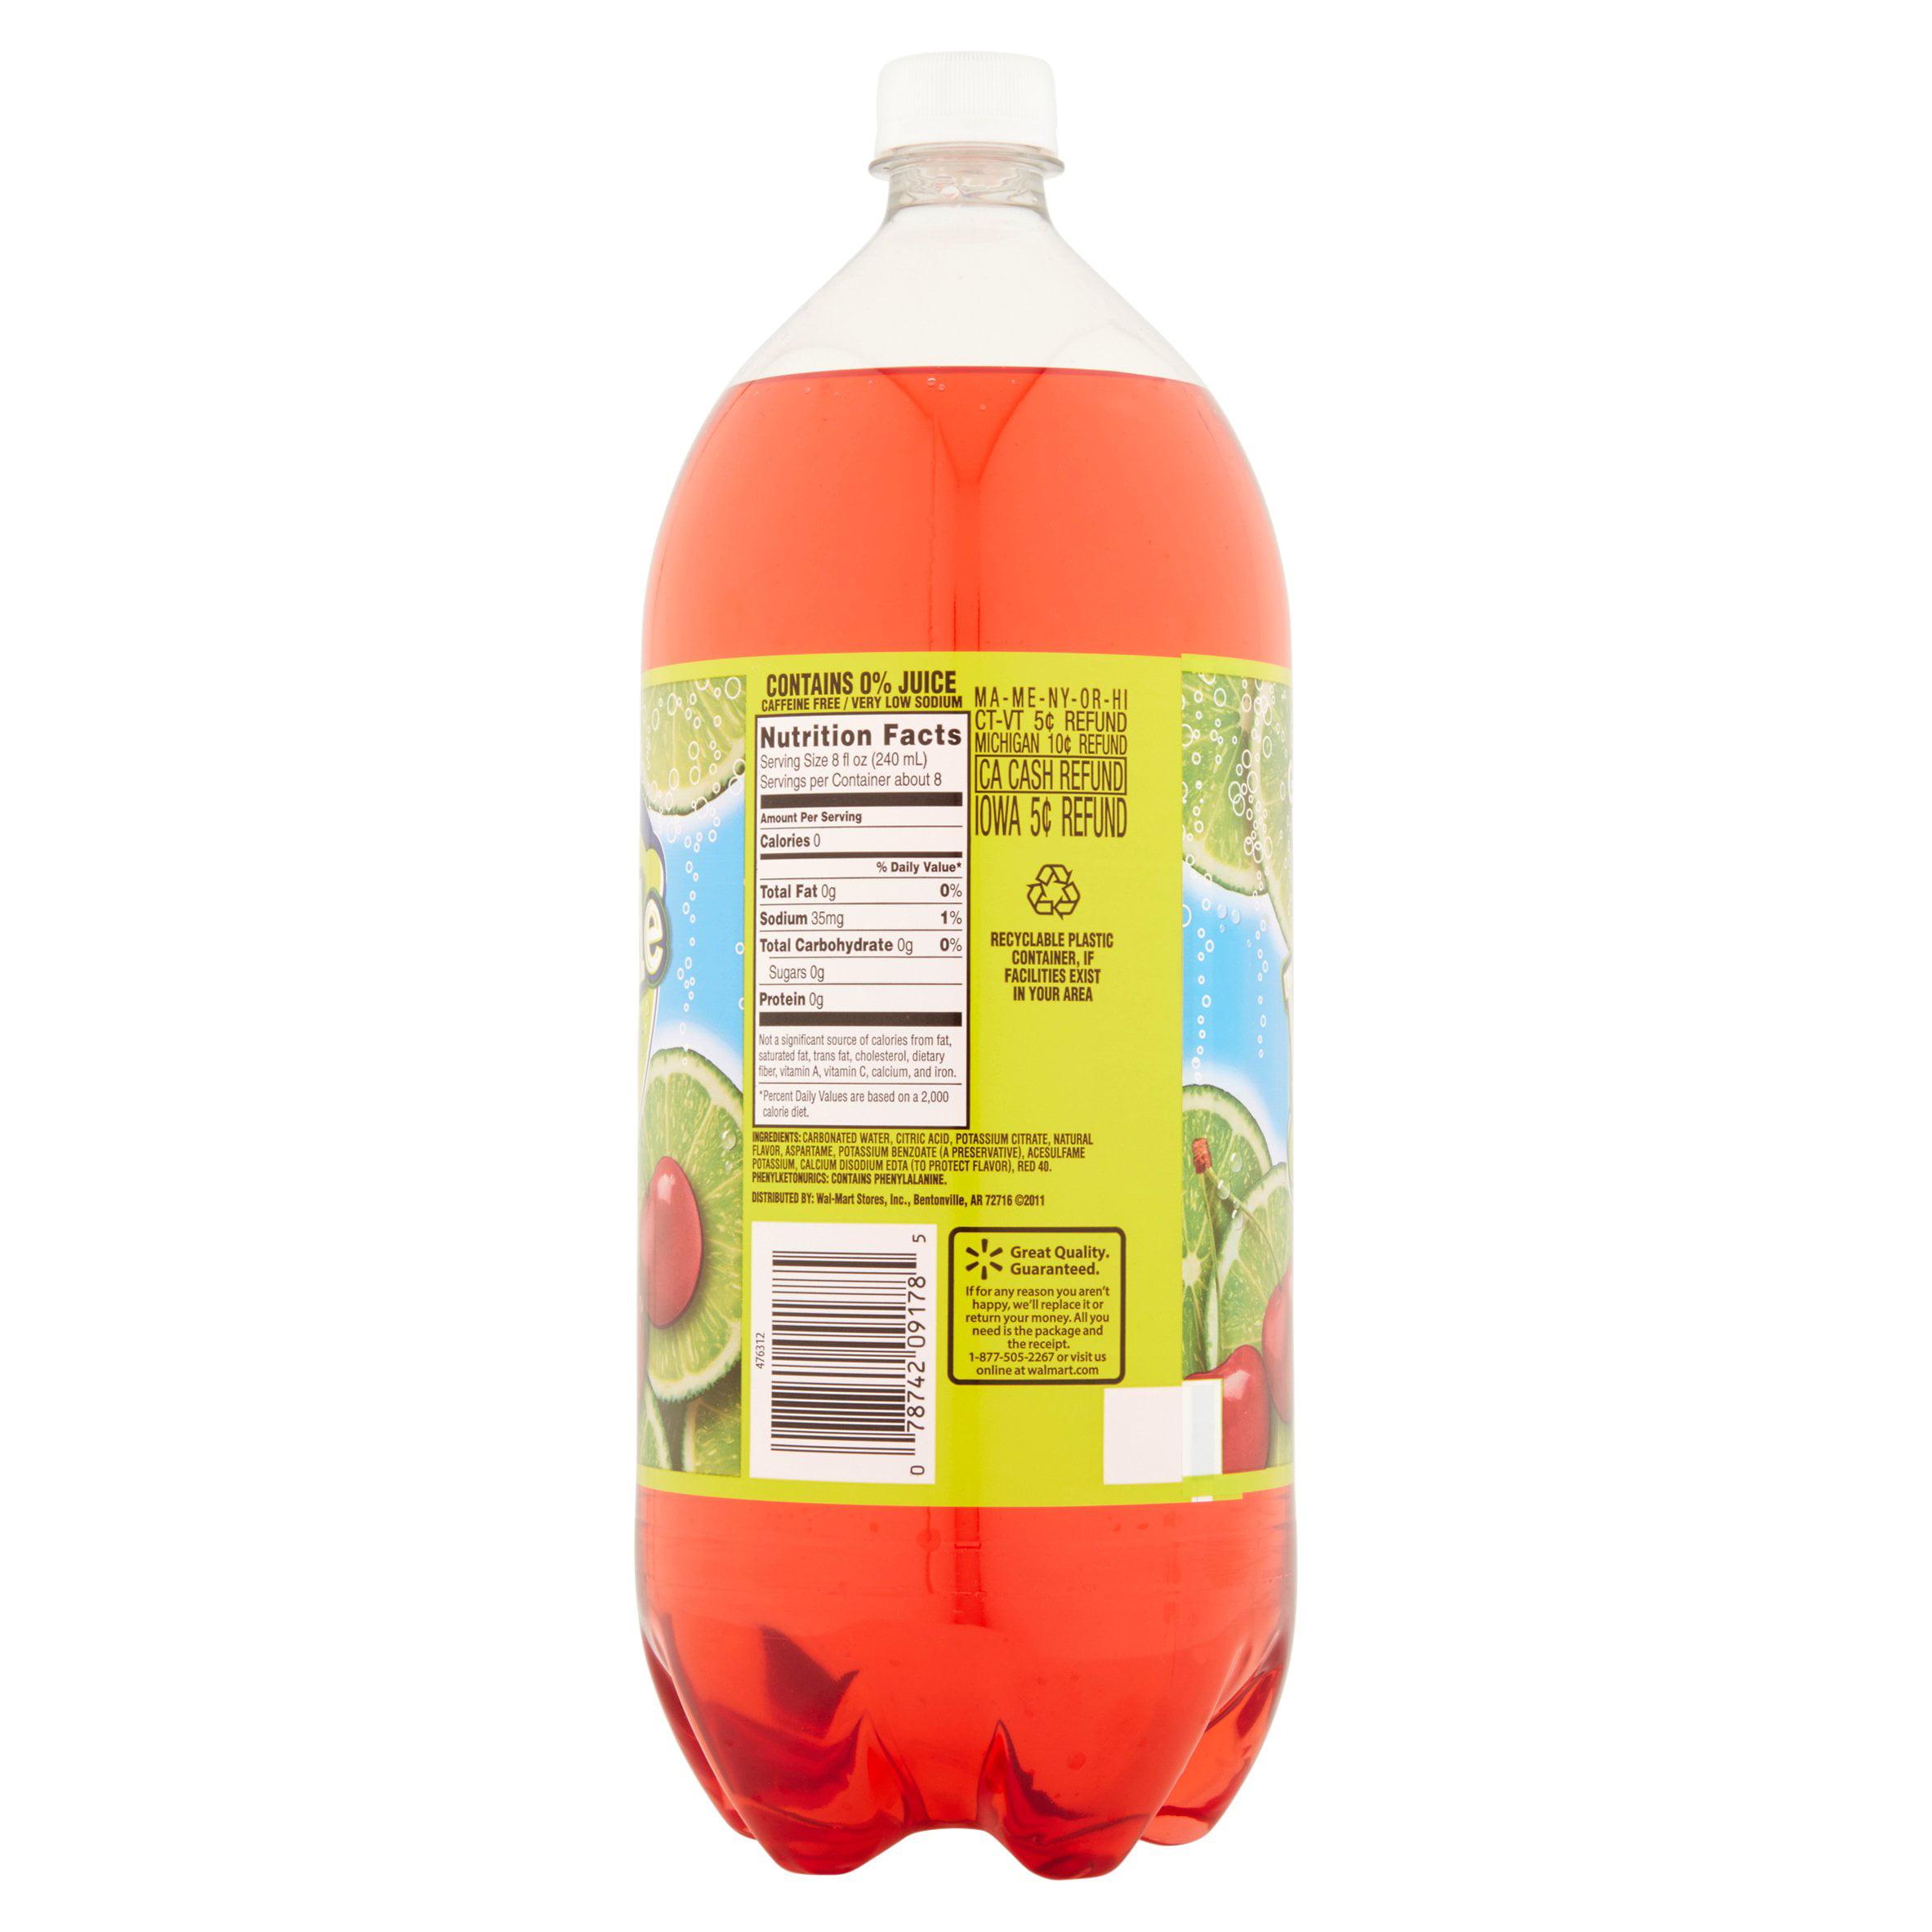 Great Value Sparkling Cherry Limeade Soda 67 6 fl oz Walmart